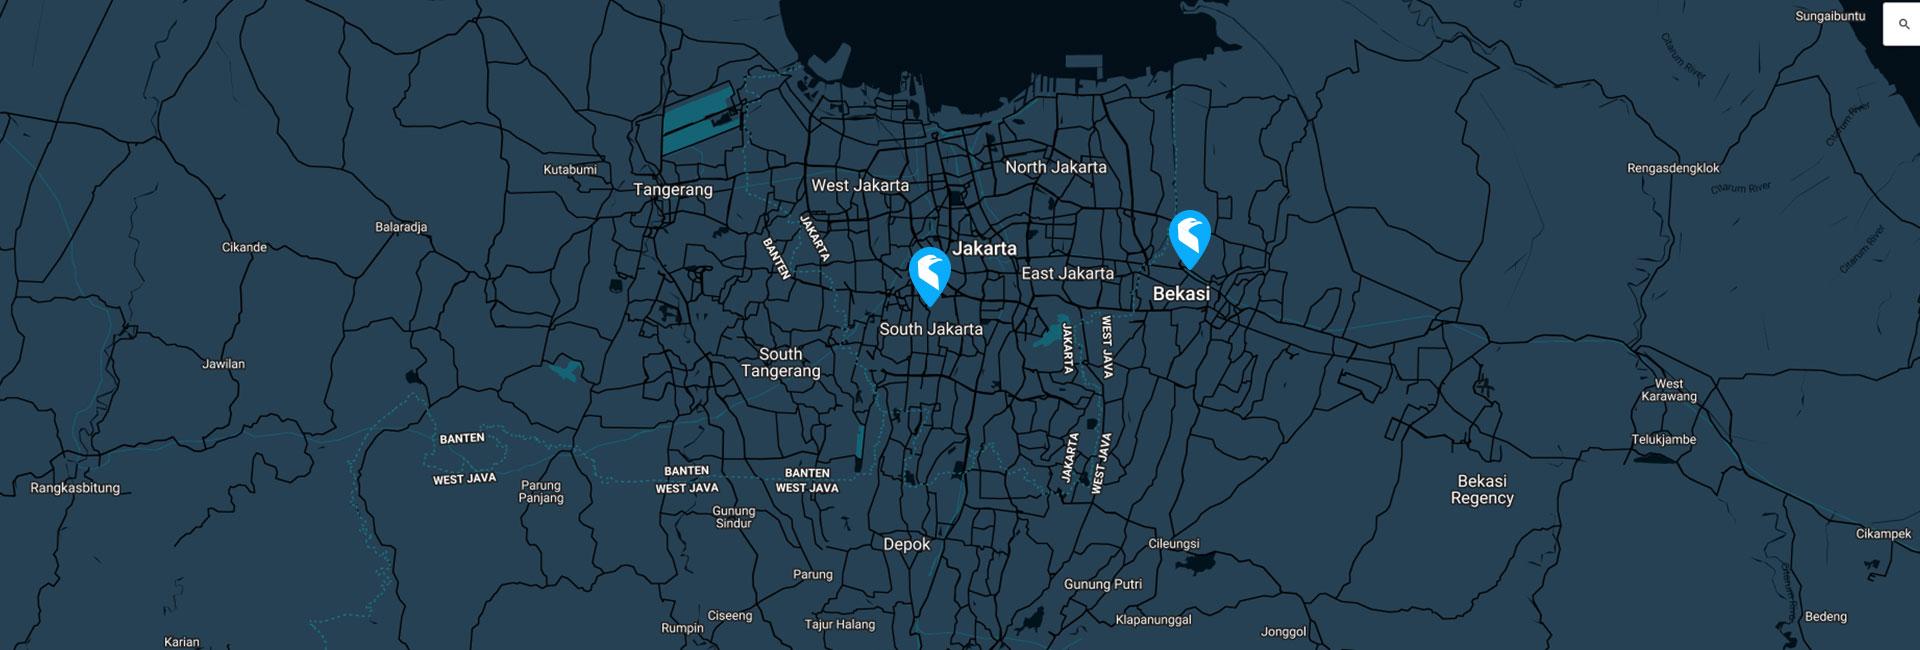 Lokasi & Fasilitas Data Center Indonesia